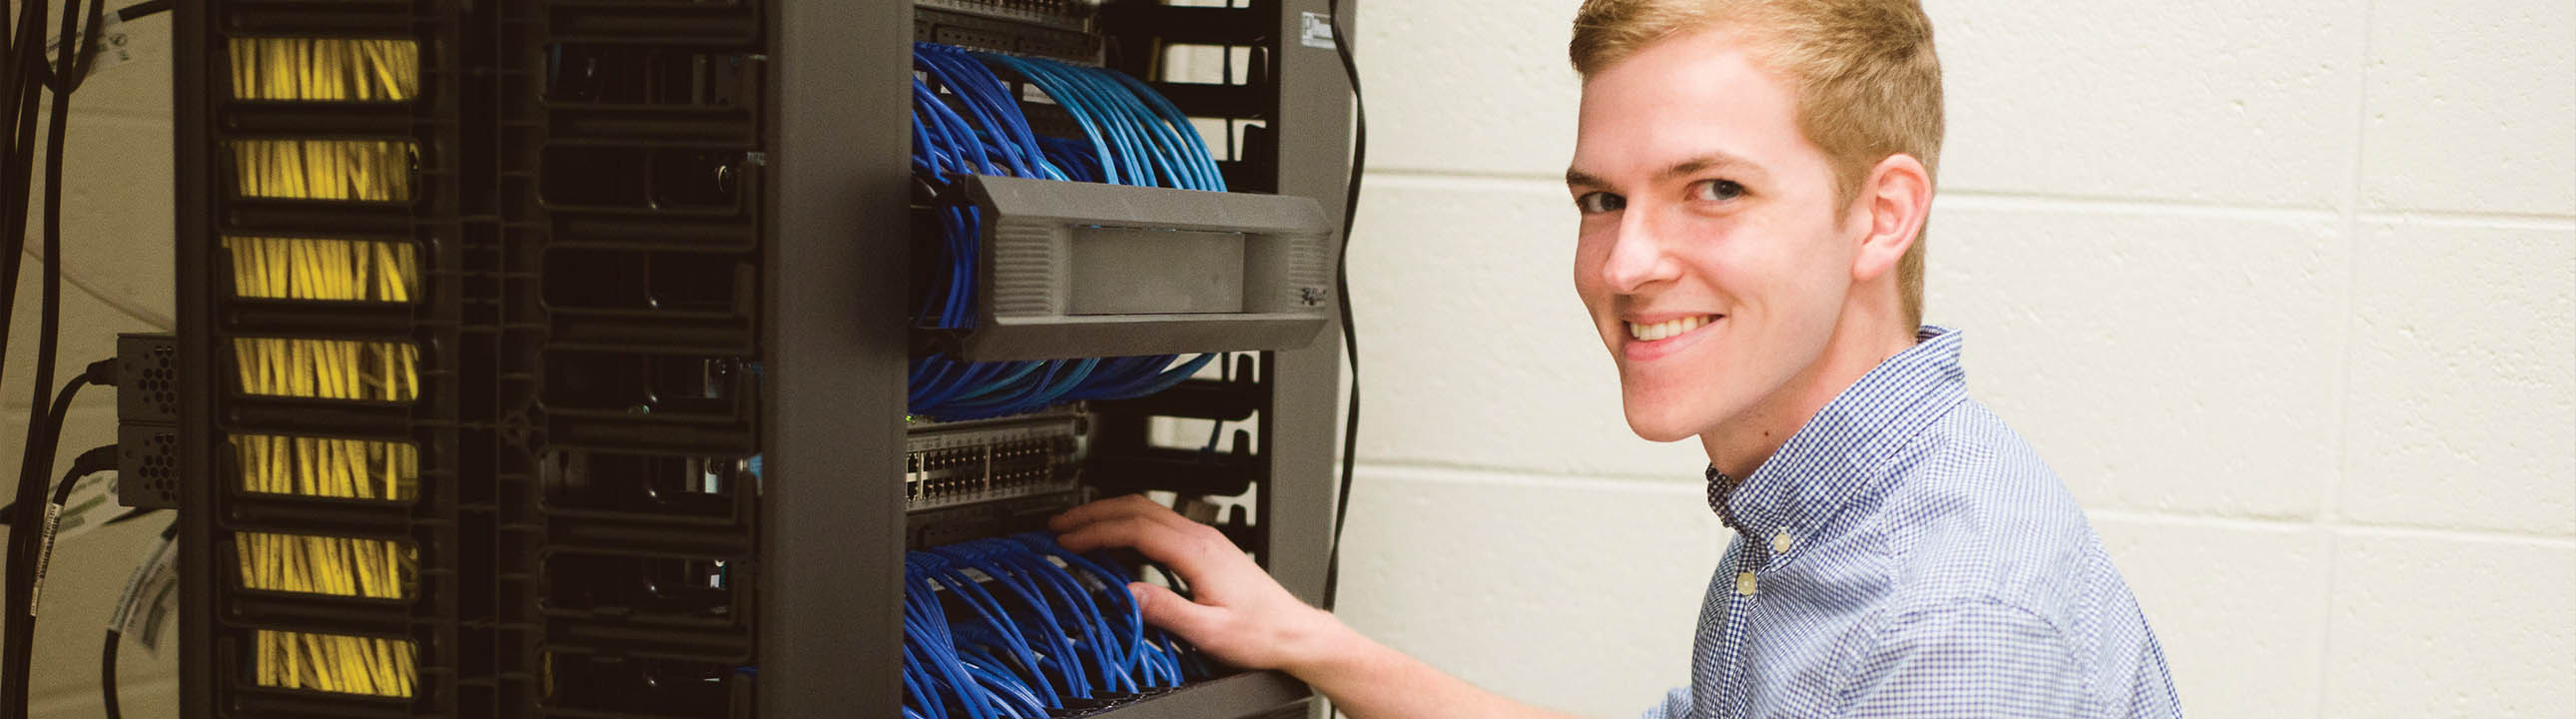 Computer Information Technology Bachelor